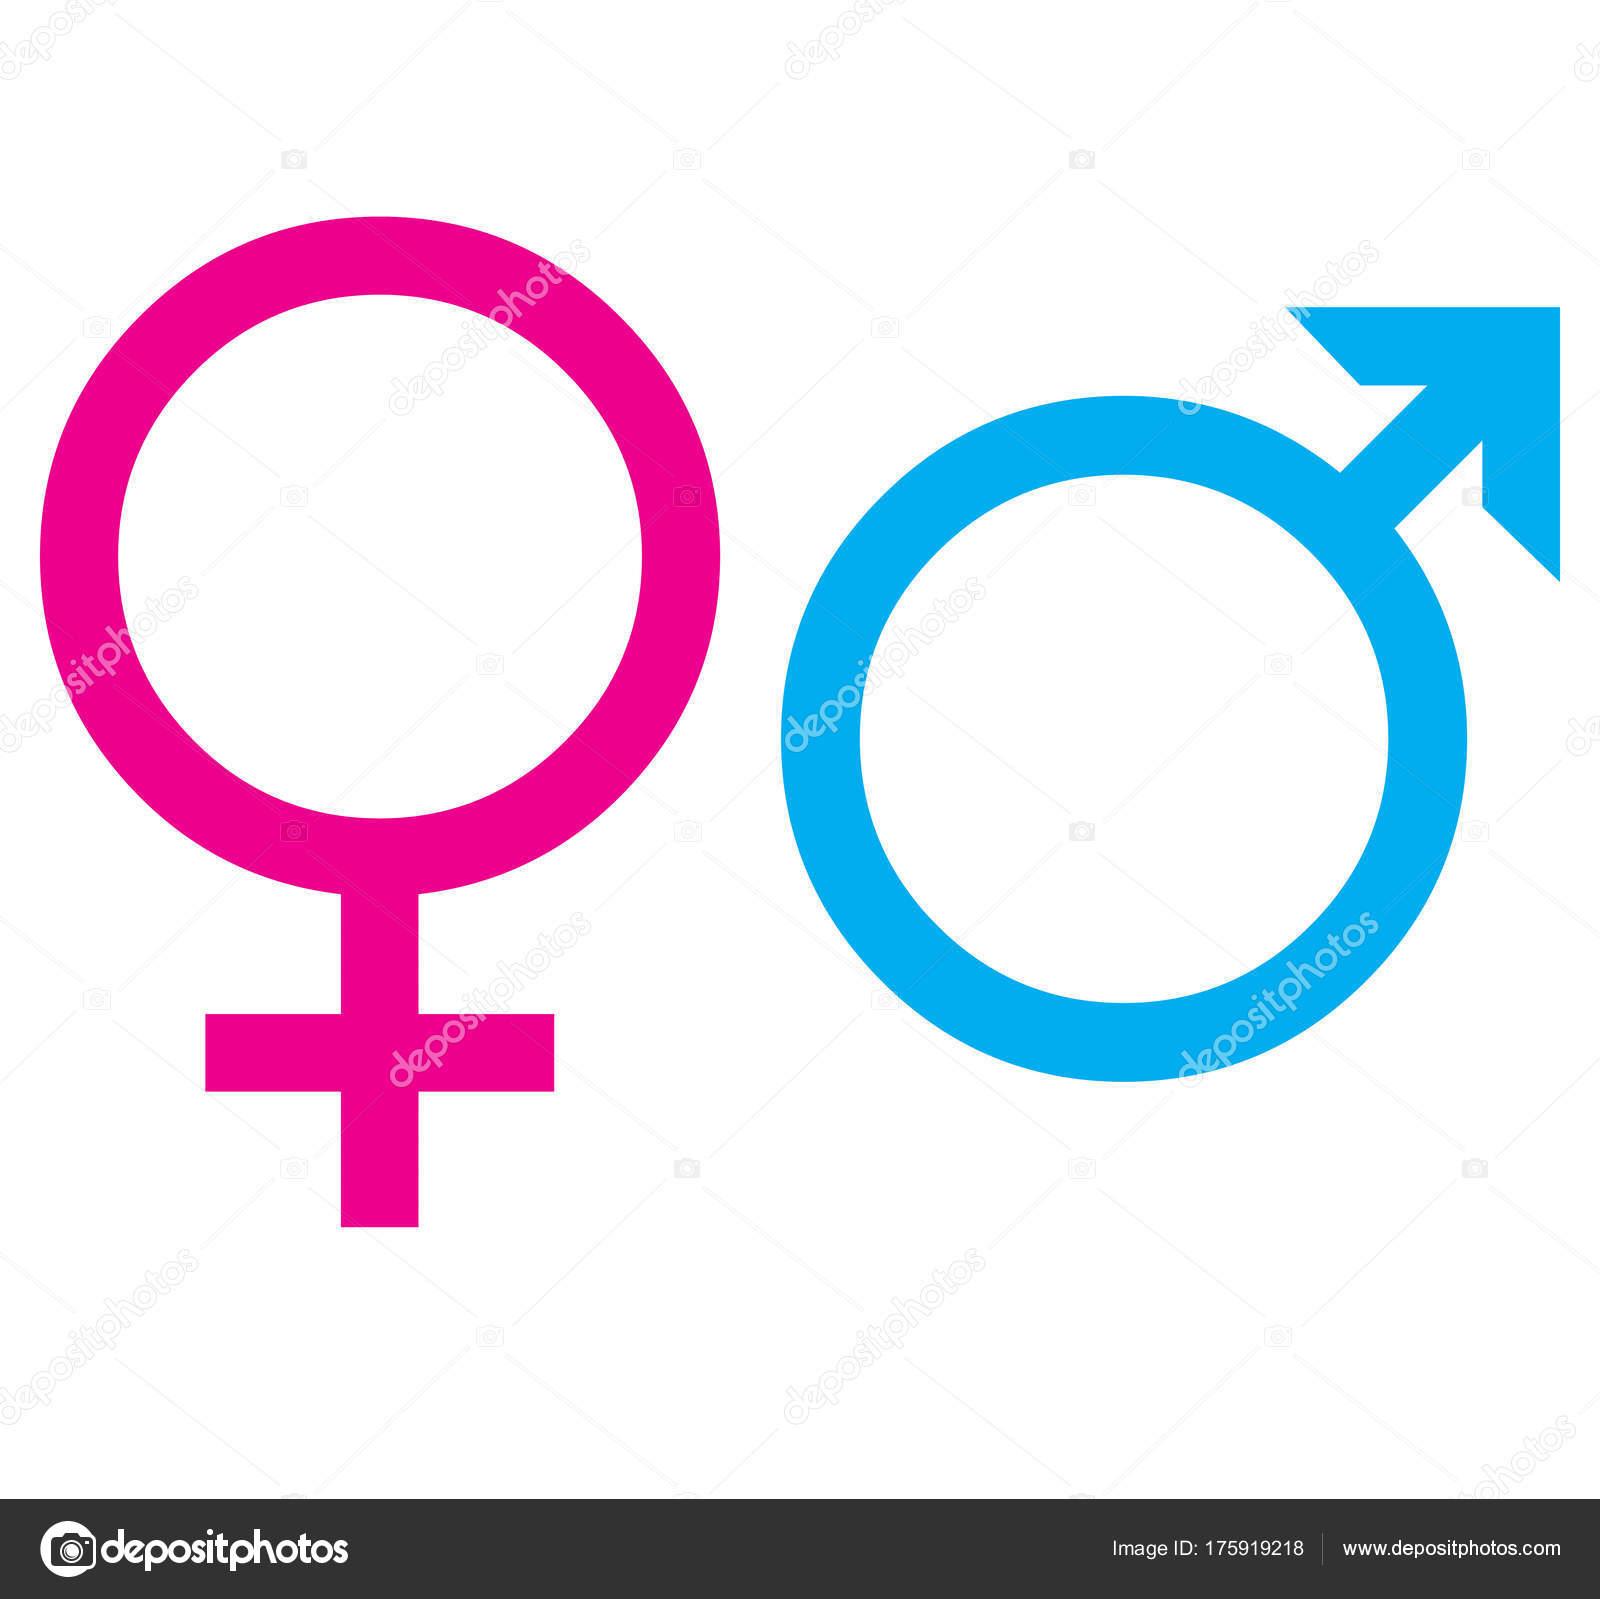 symbols women men ⬇ stock photo, image by © ricochet69 #175919218  depositphotos